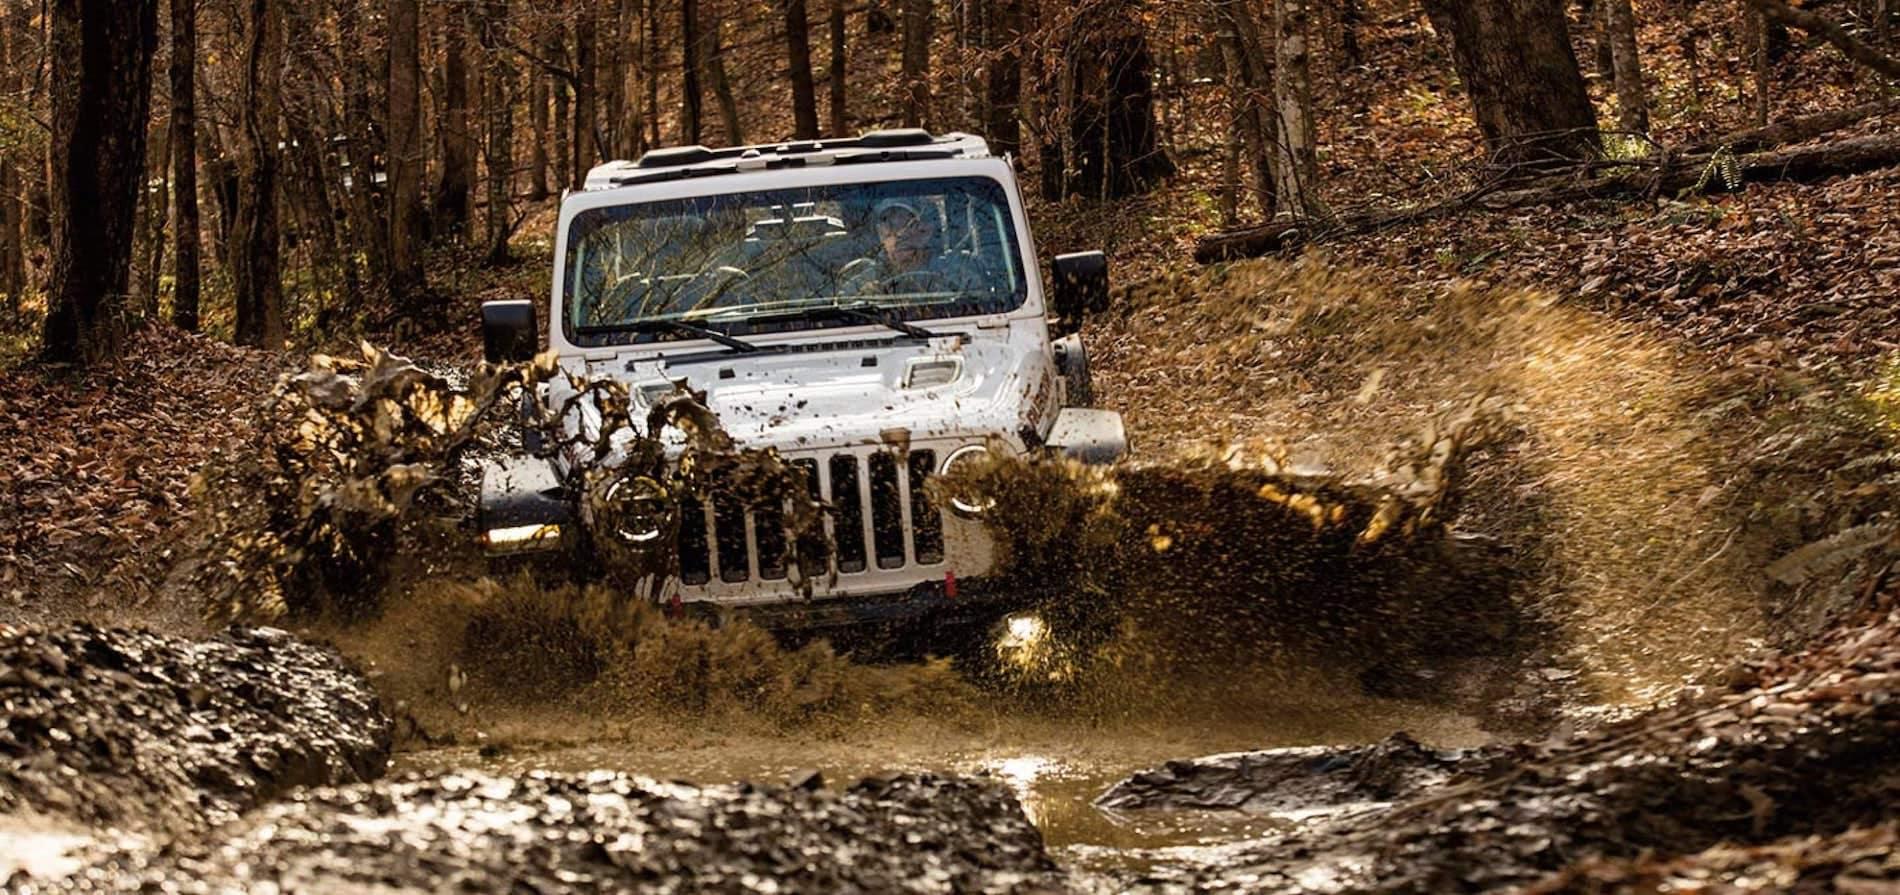 2021 Jeep Wrangler Capabilities in the mud